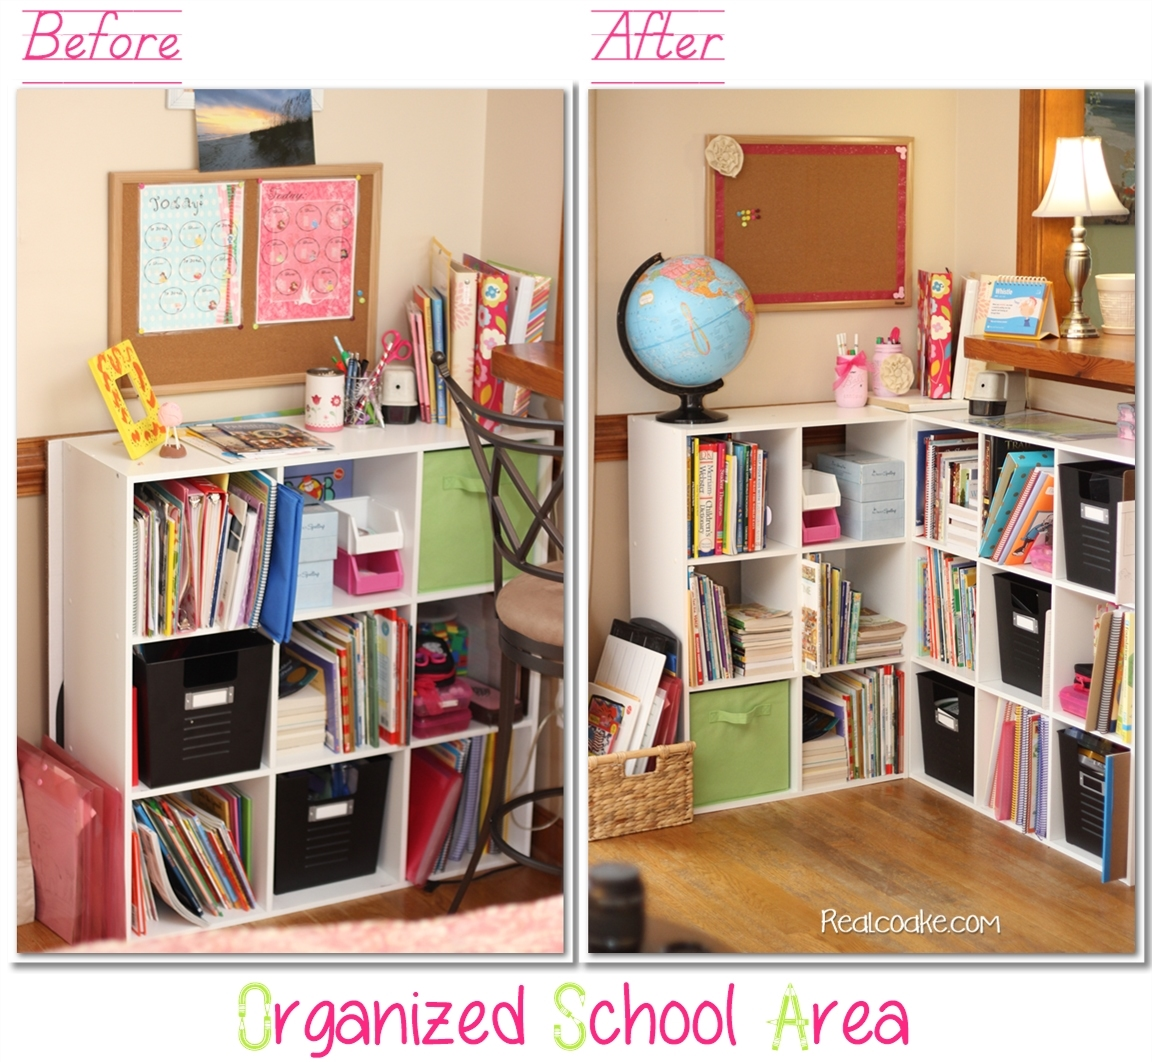 Homeschool Room Ideas Small Spaces: Our Newly Organized School Area {Homeschool Organization ...